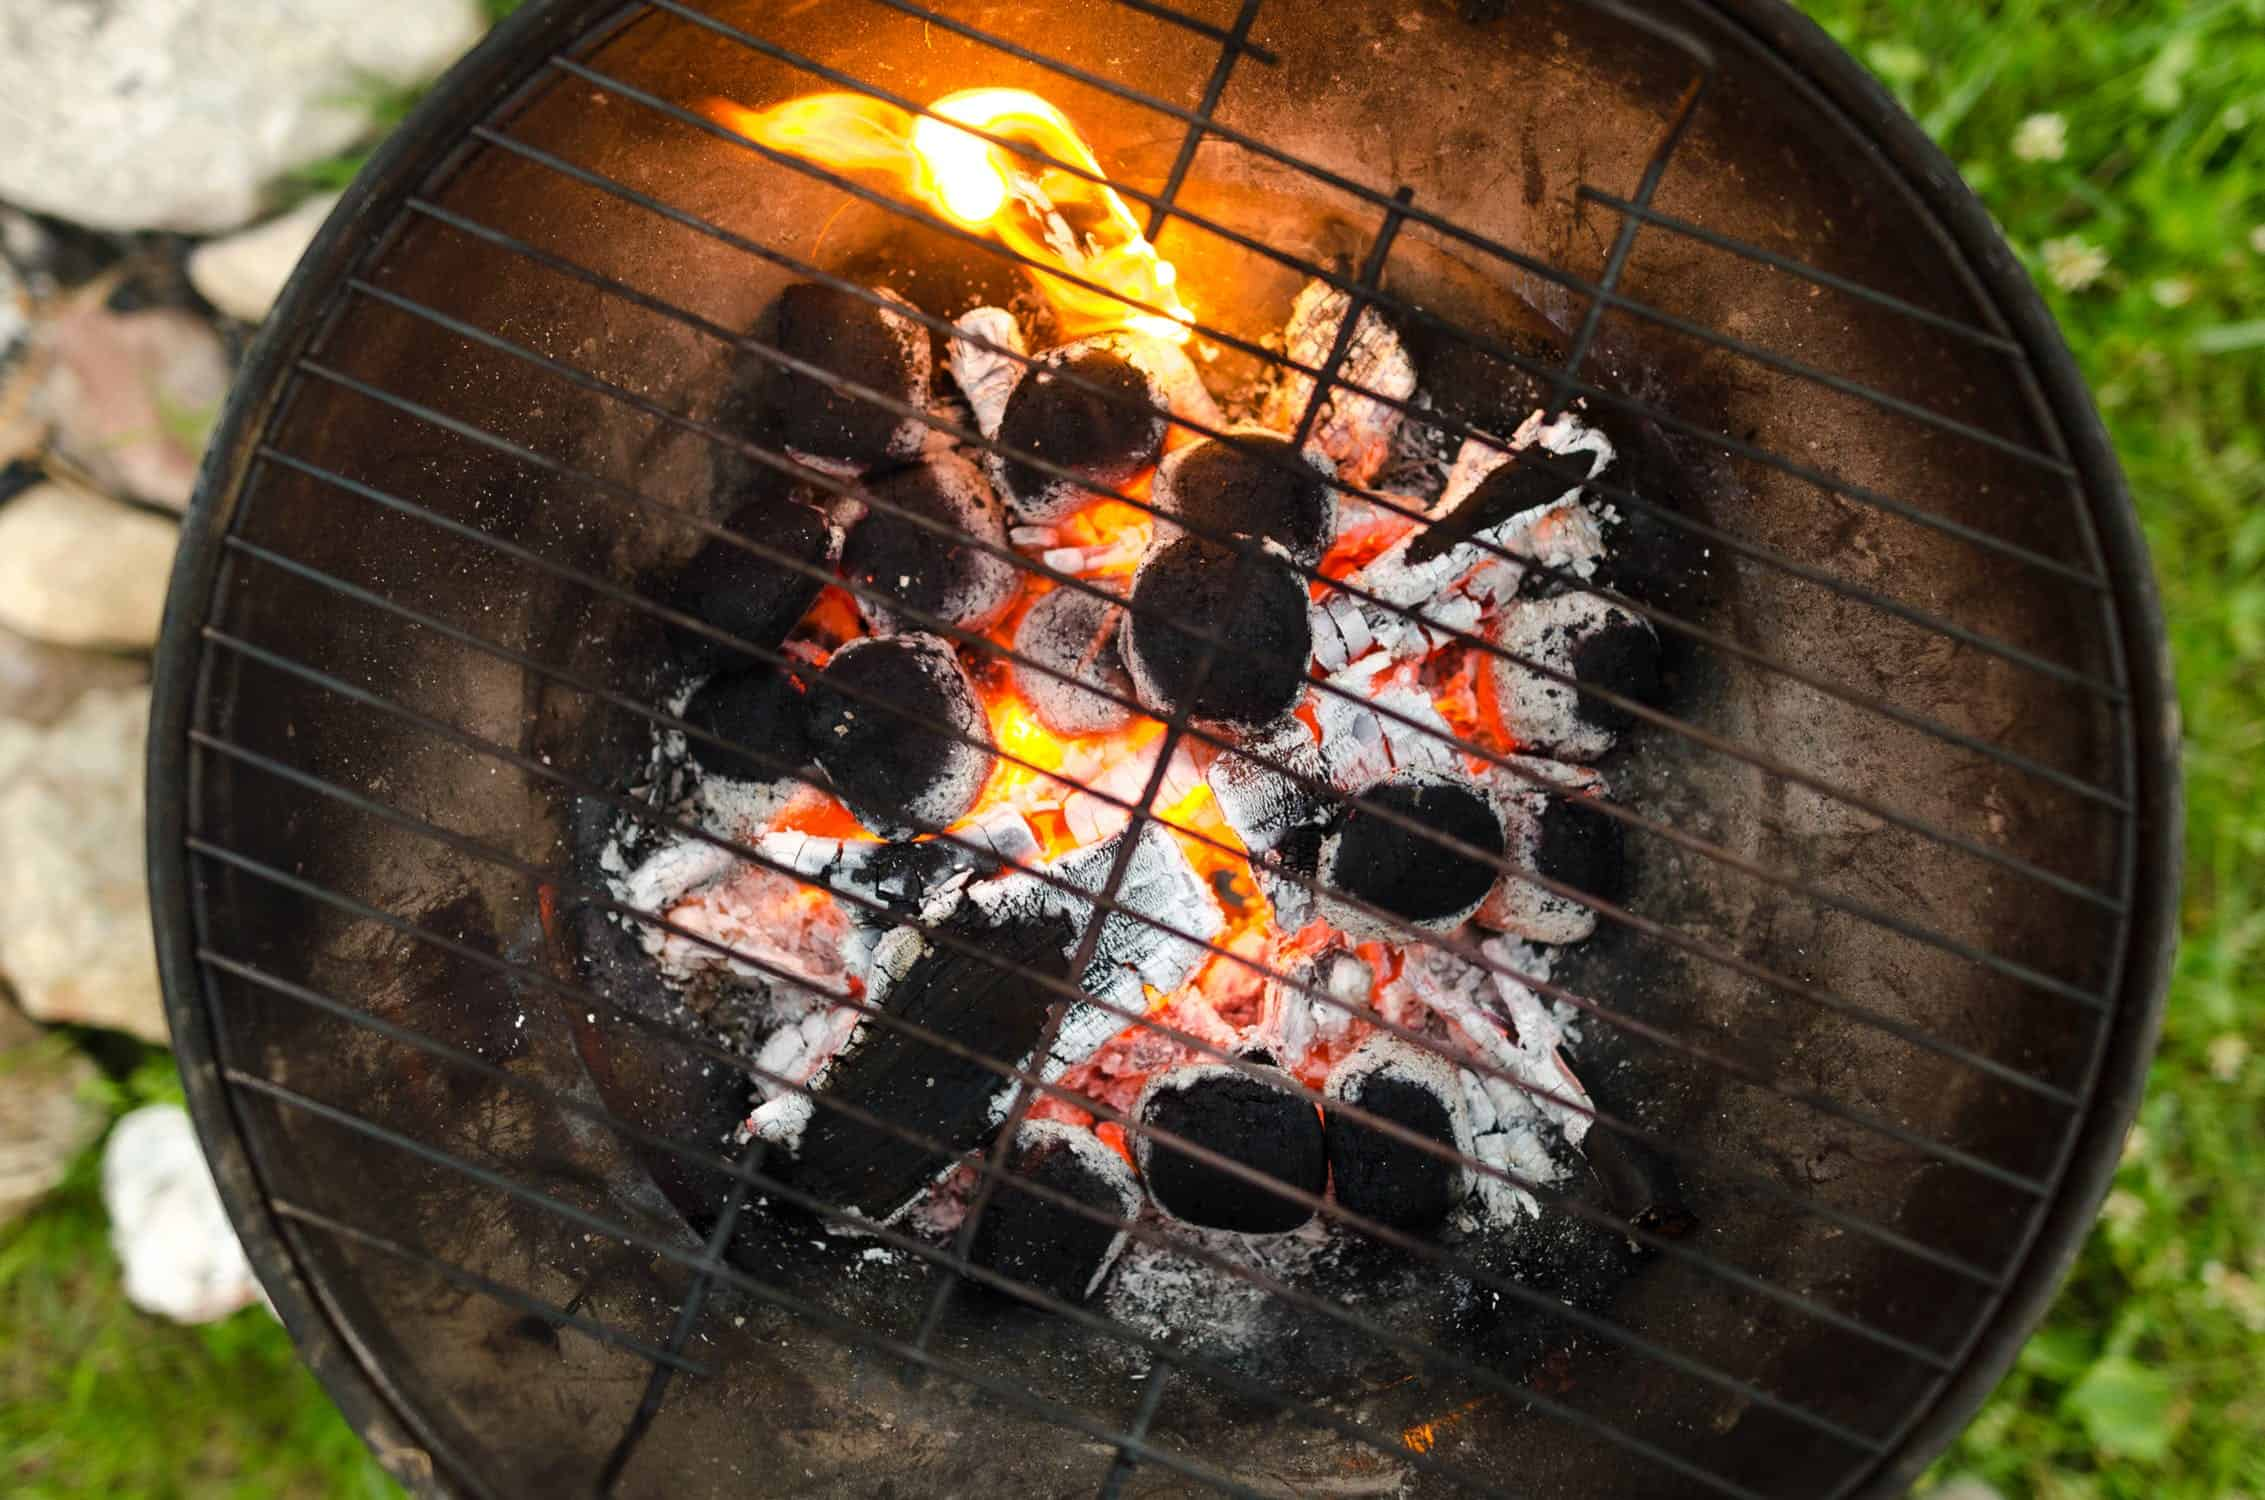 a charcoal weber grill alternative